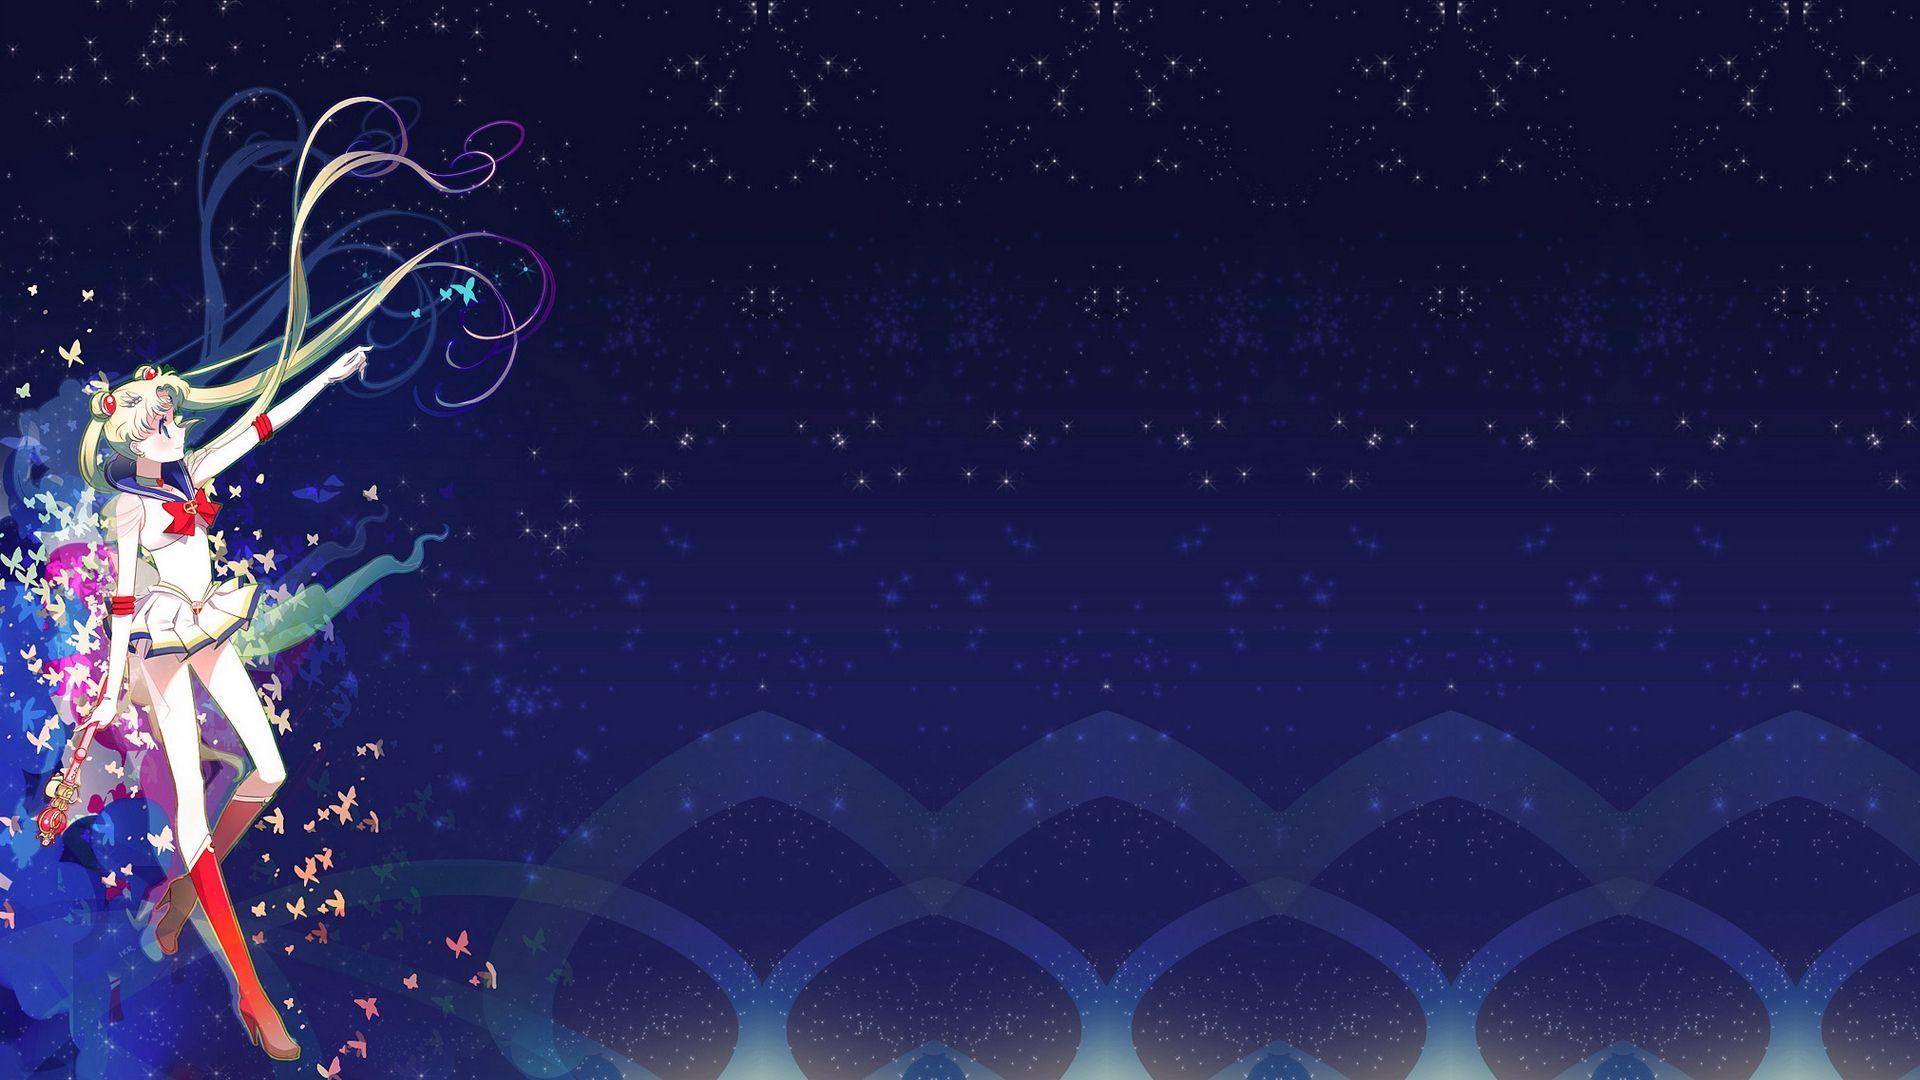 Sailor Moon Wallpapers Top Free Sailor Moon Backgrounds Wallpaperaccess Sailor Moon Background Sailor Moon Wallpaper Sailor Moon